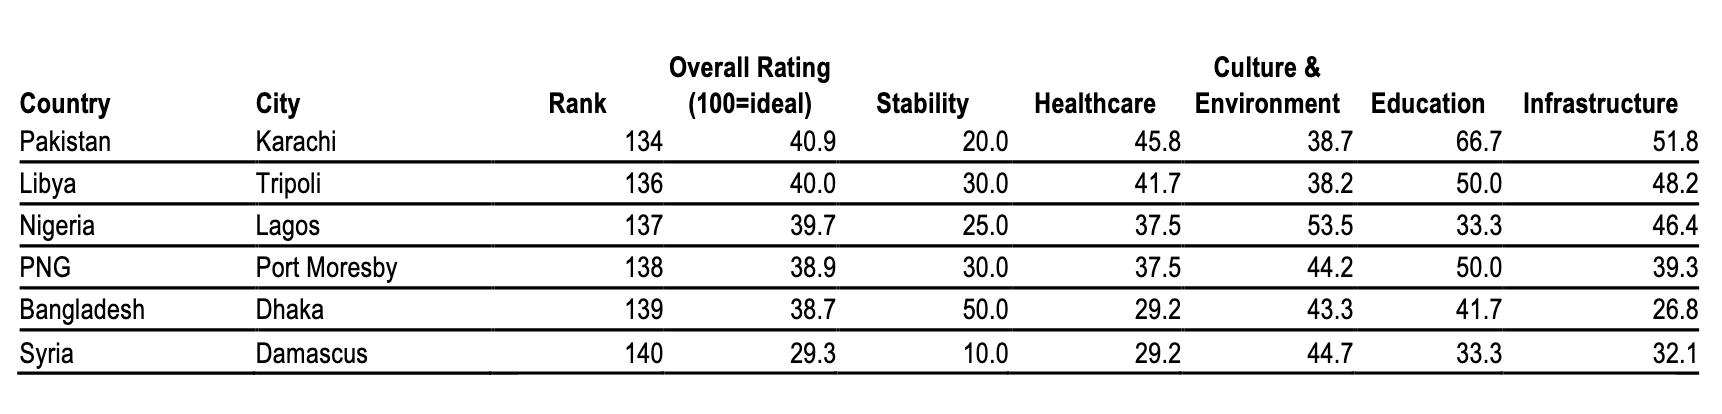 Liveability ranking